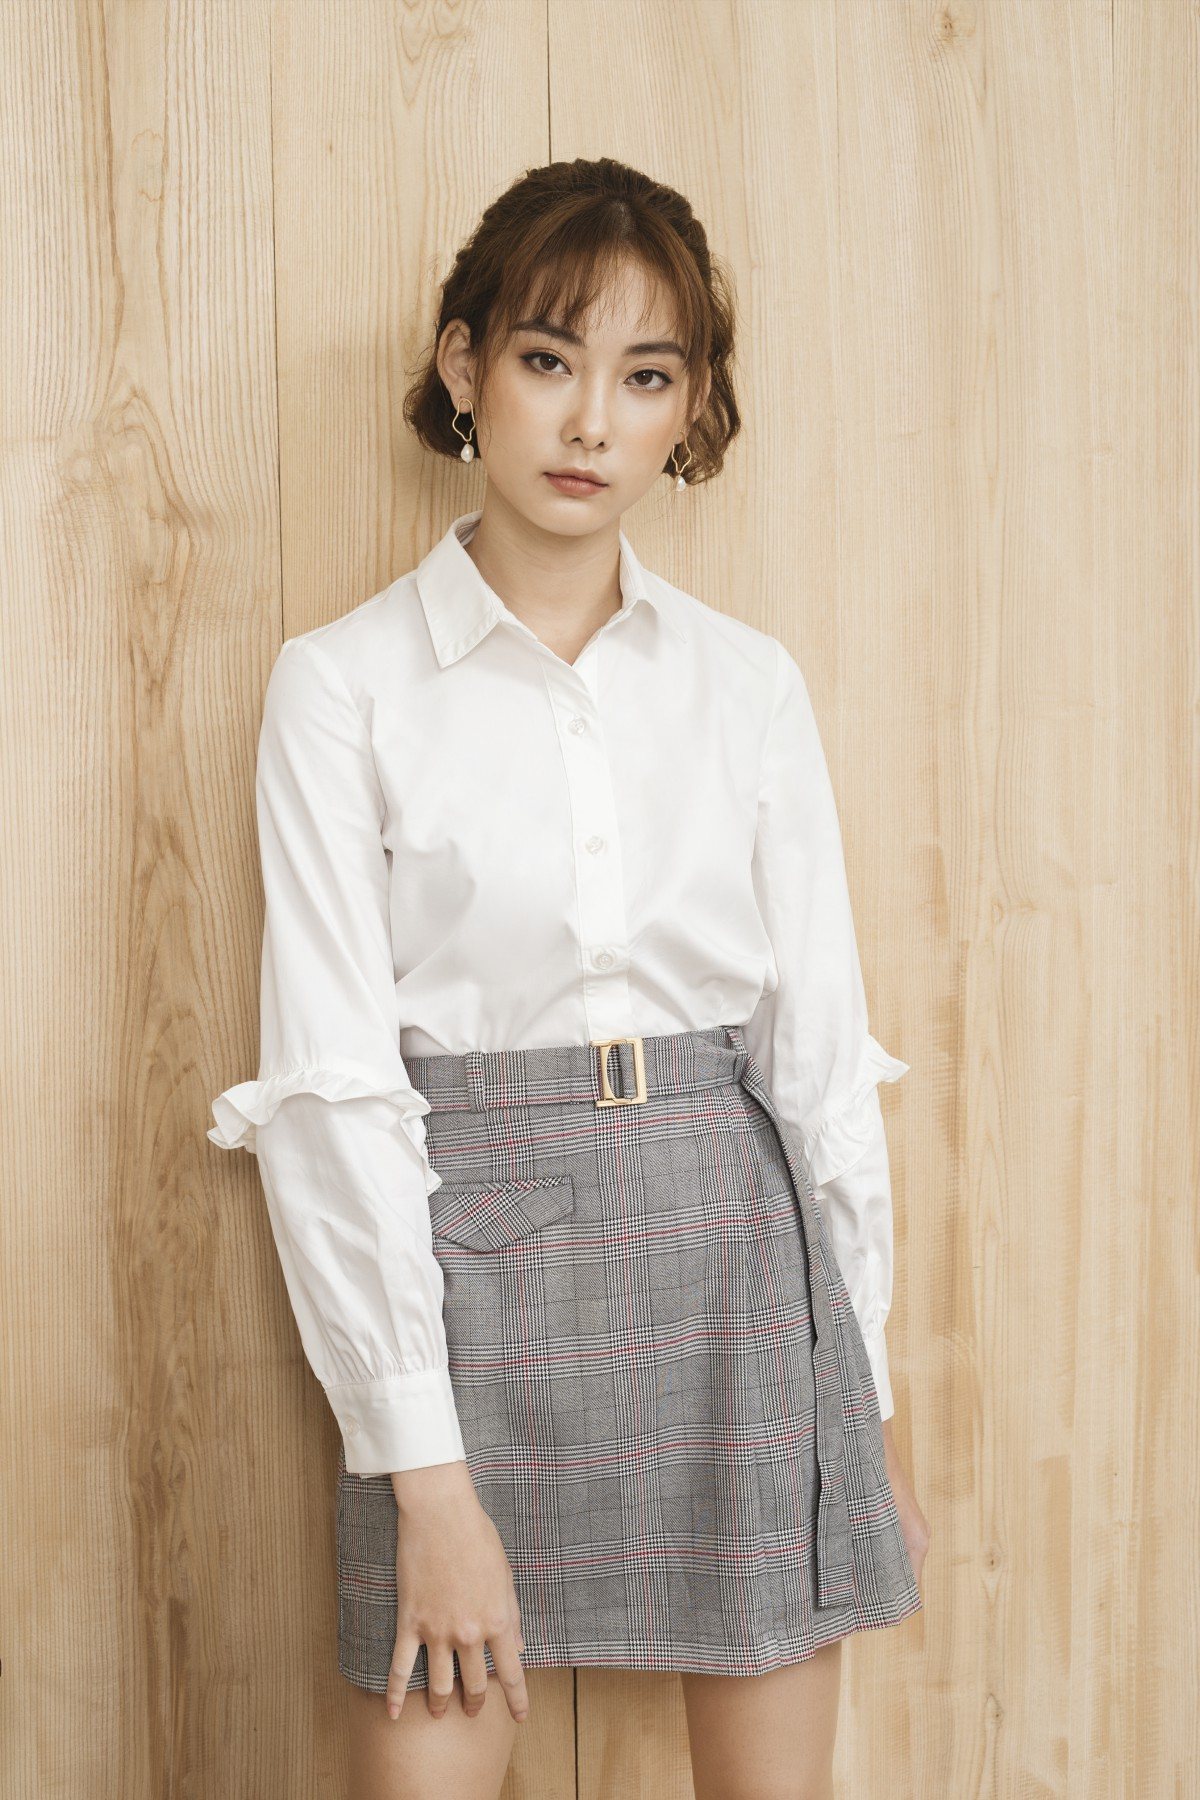 Plaid Pleated Skirt - Váy Kẻ Xếp Ly Đai Kim Loại